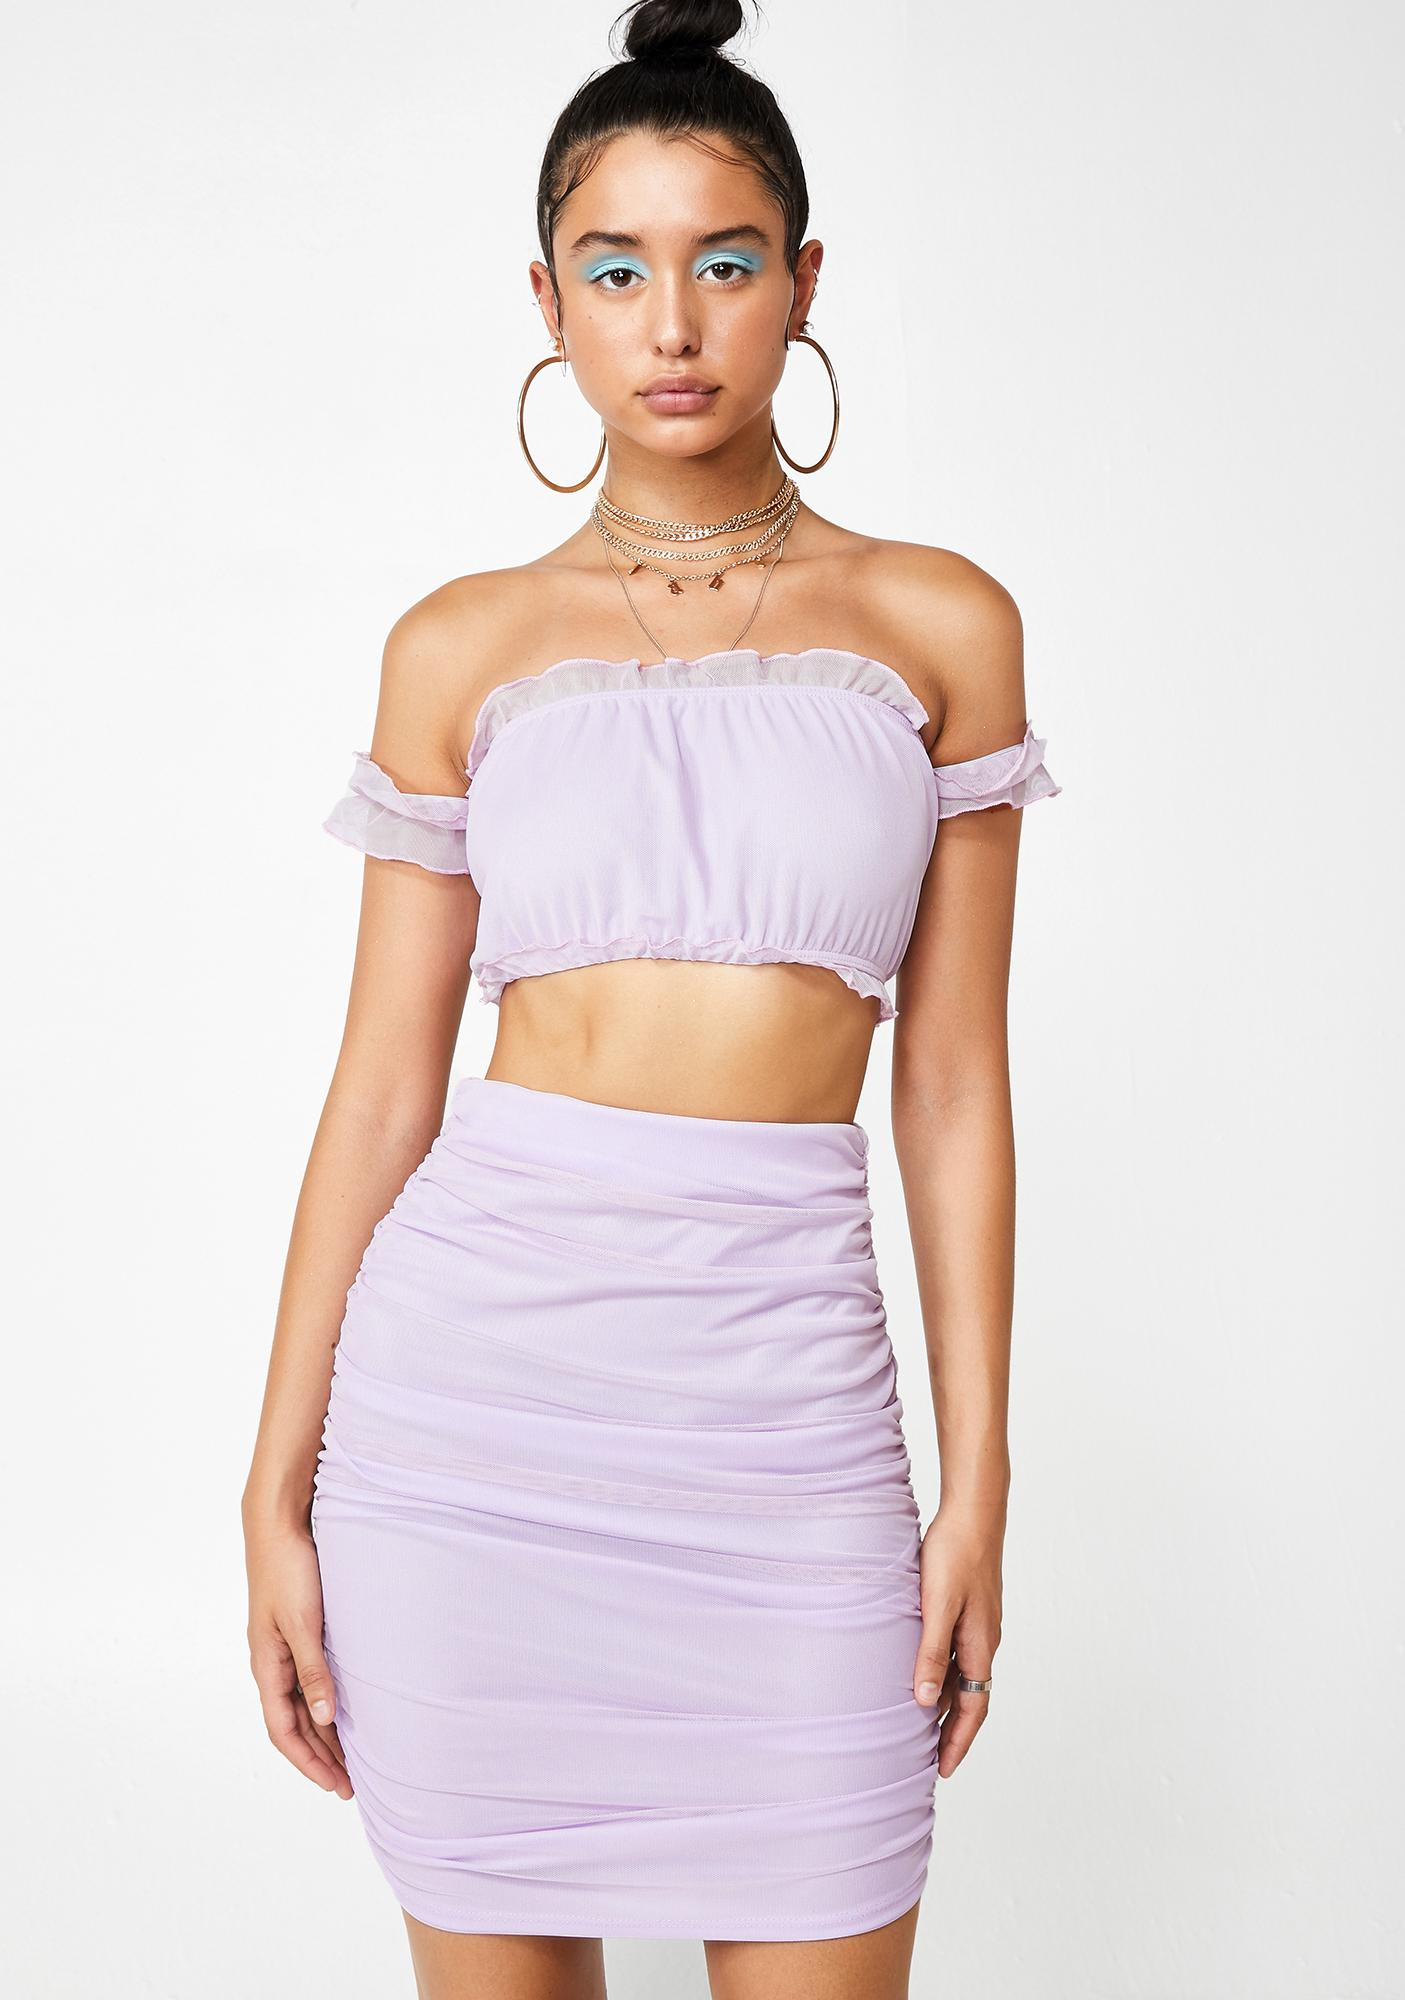 Fairy Ruff N' Tumble Skirt Set